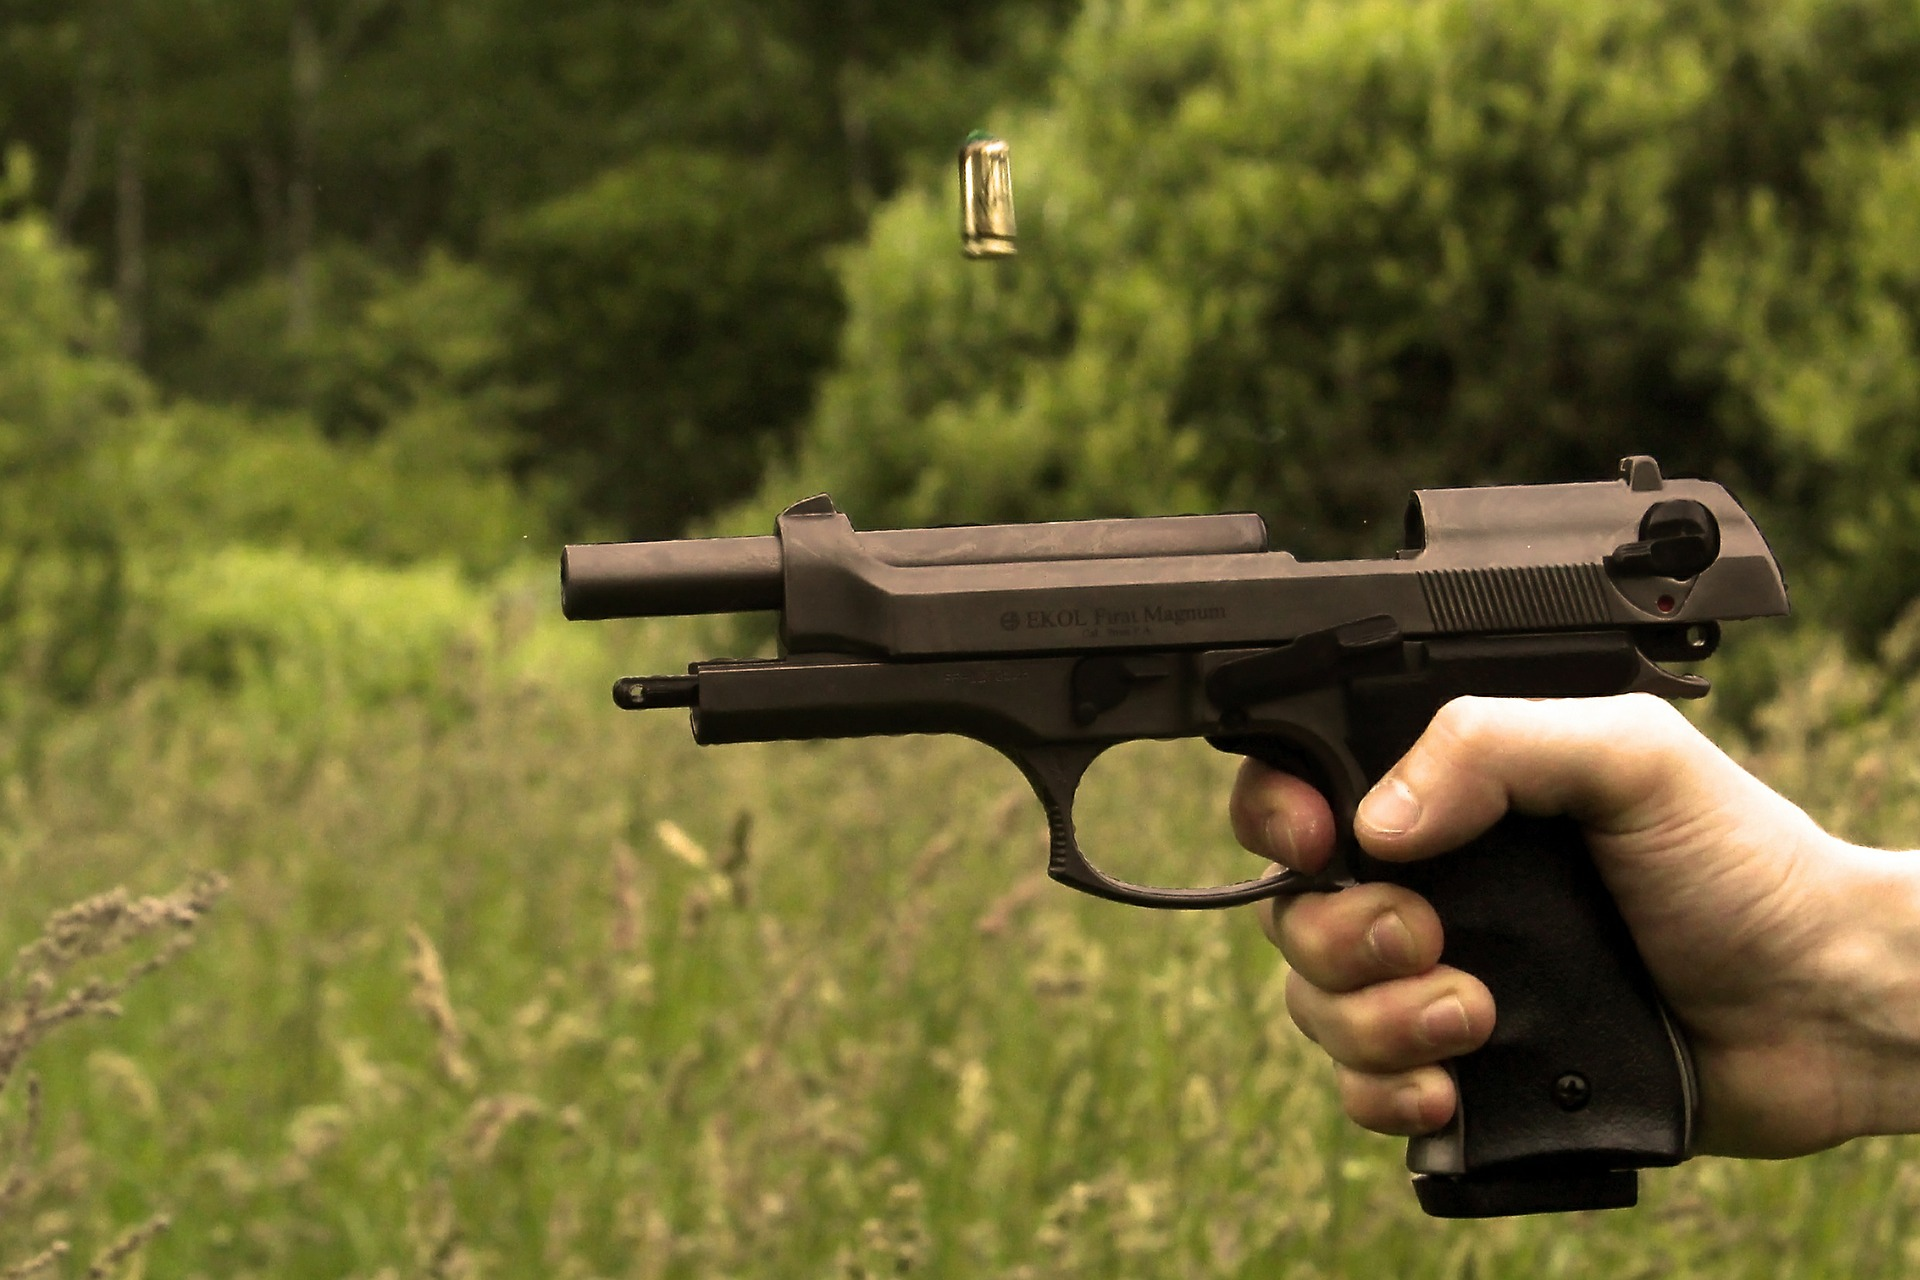 arma care ucide